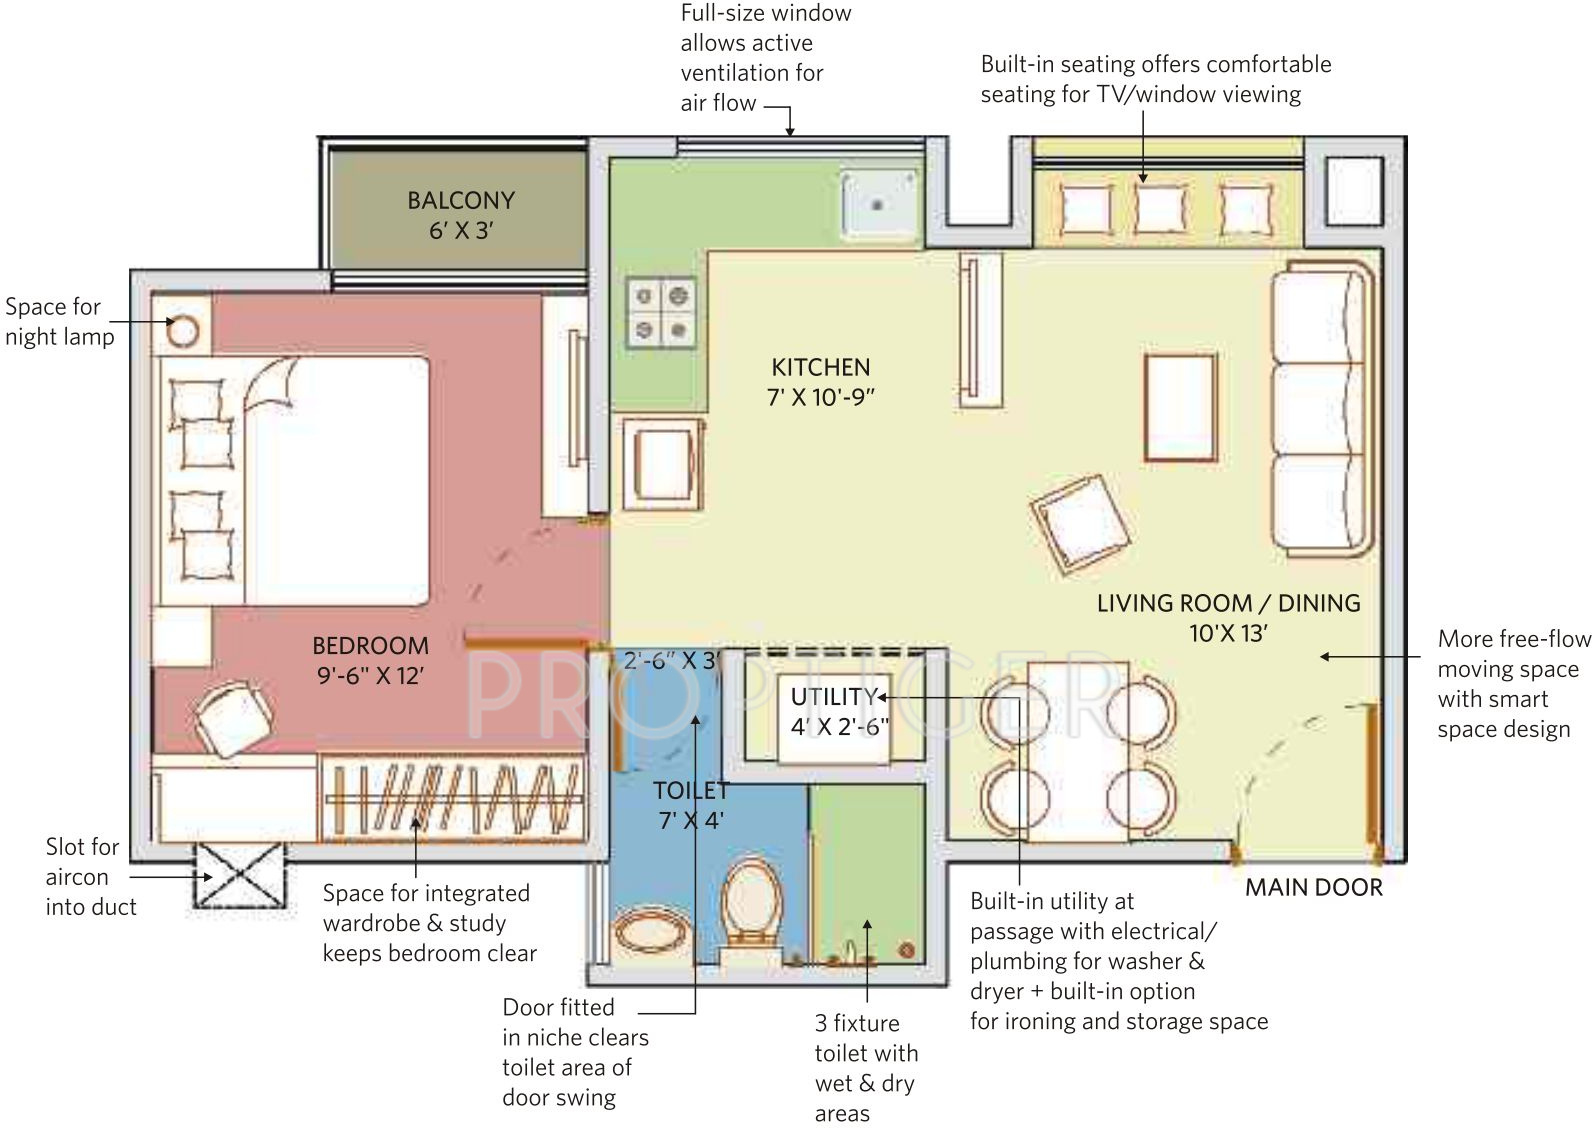 100 wet republic floor plan corporate interior for 1 moulmein rise floor plan